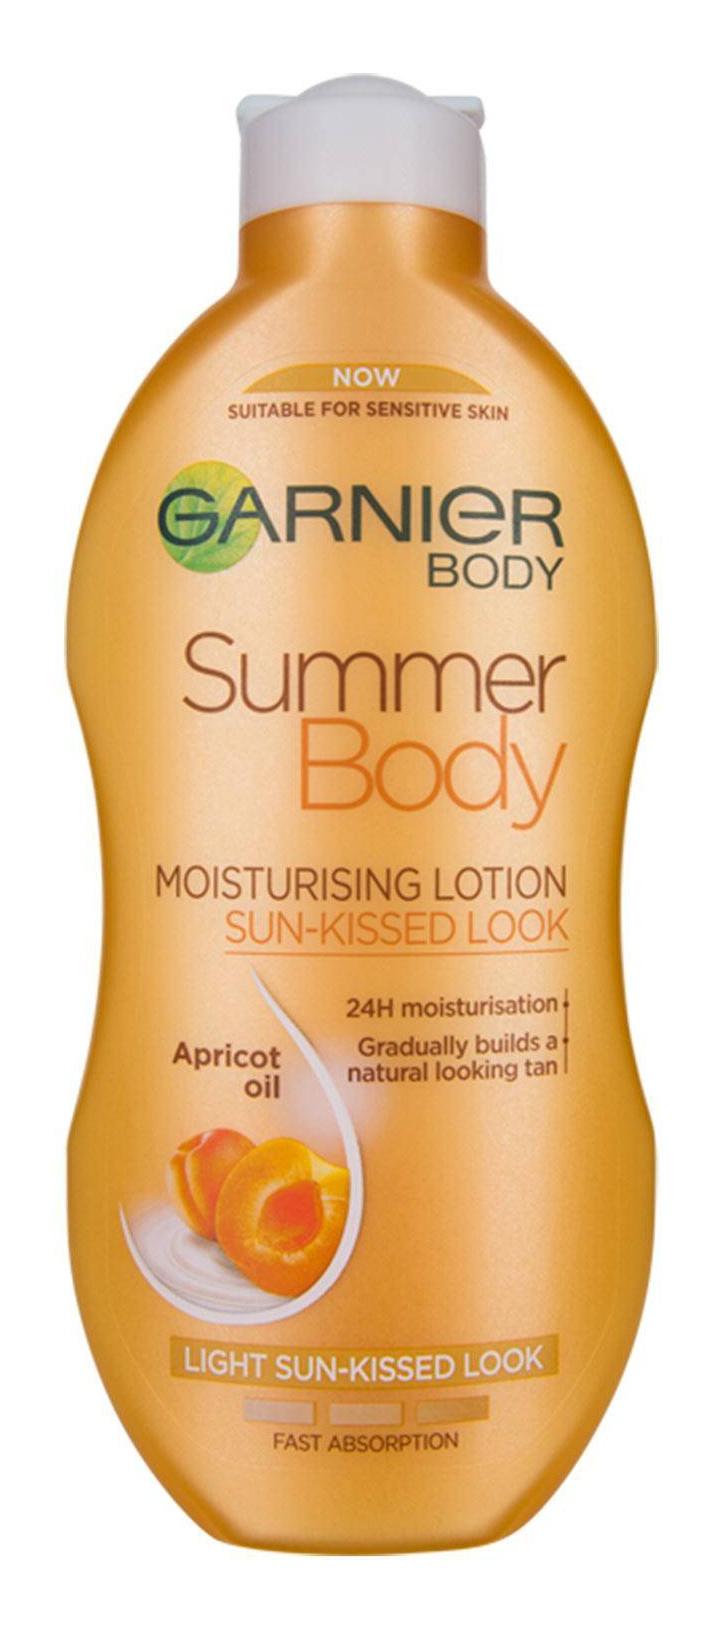 Garnier Summer Body Sun-Kissed Light Lotion